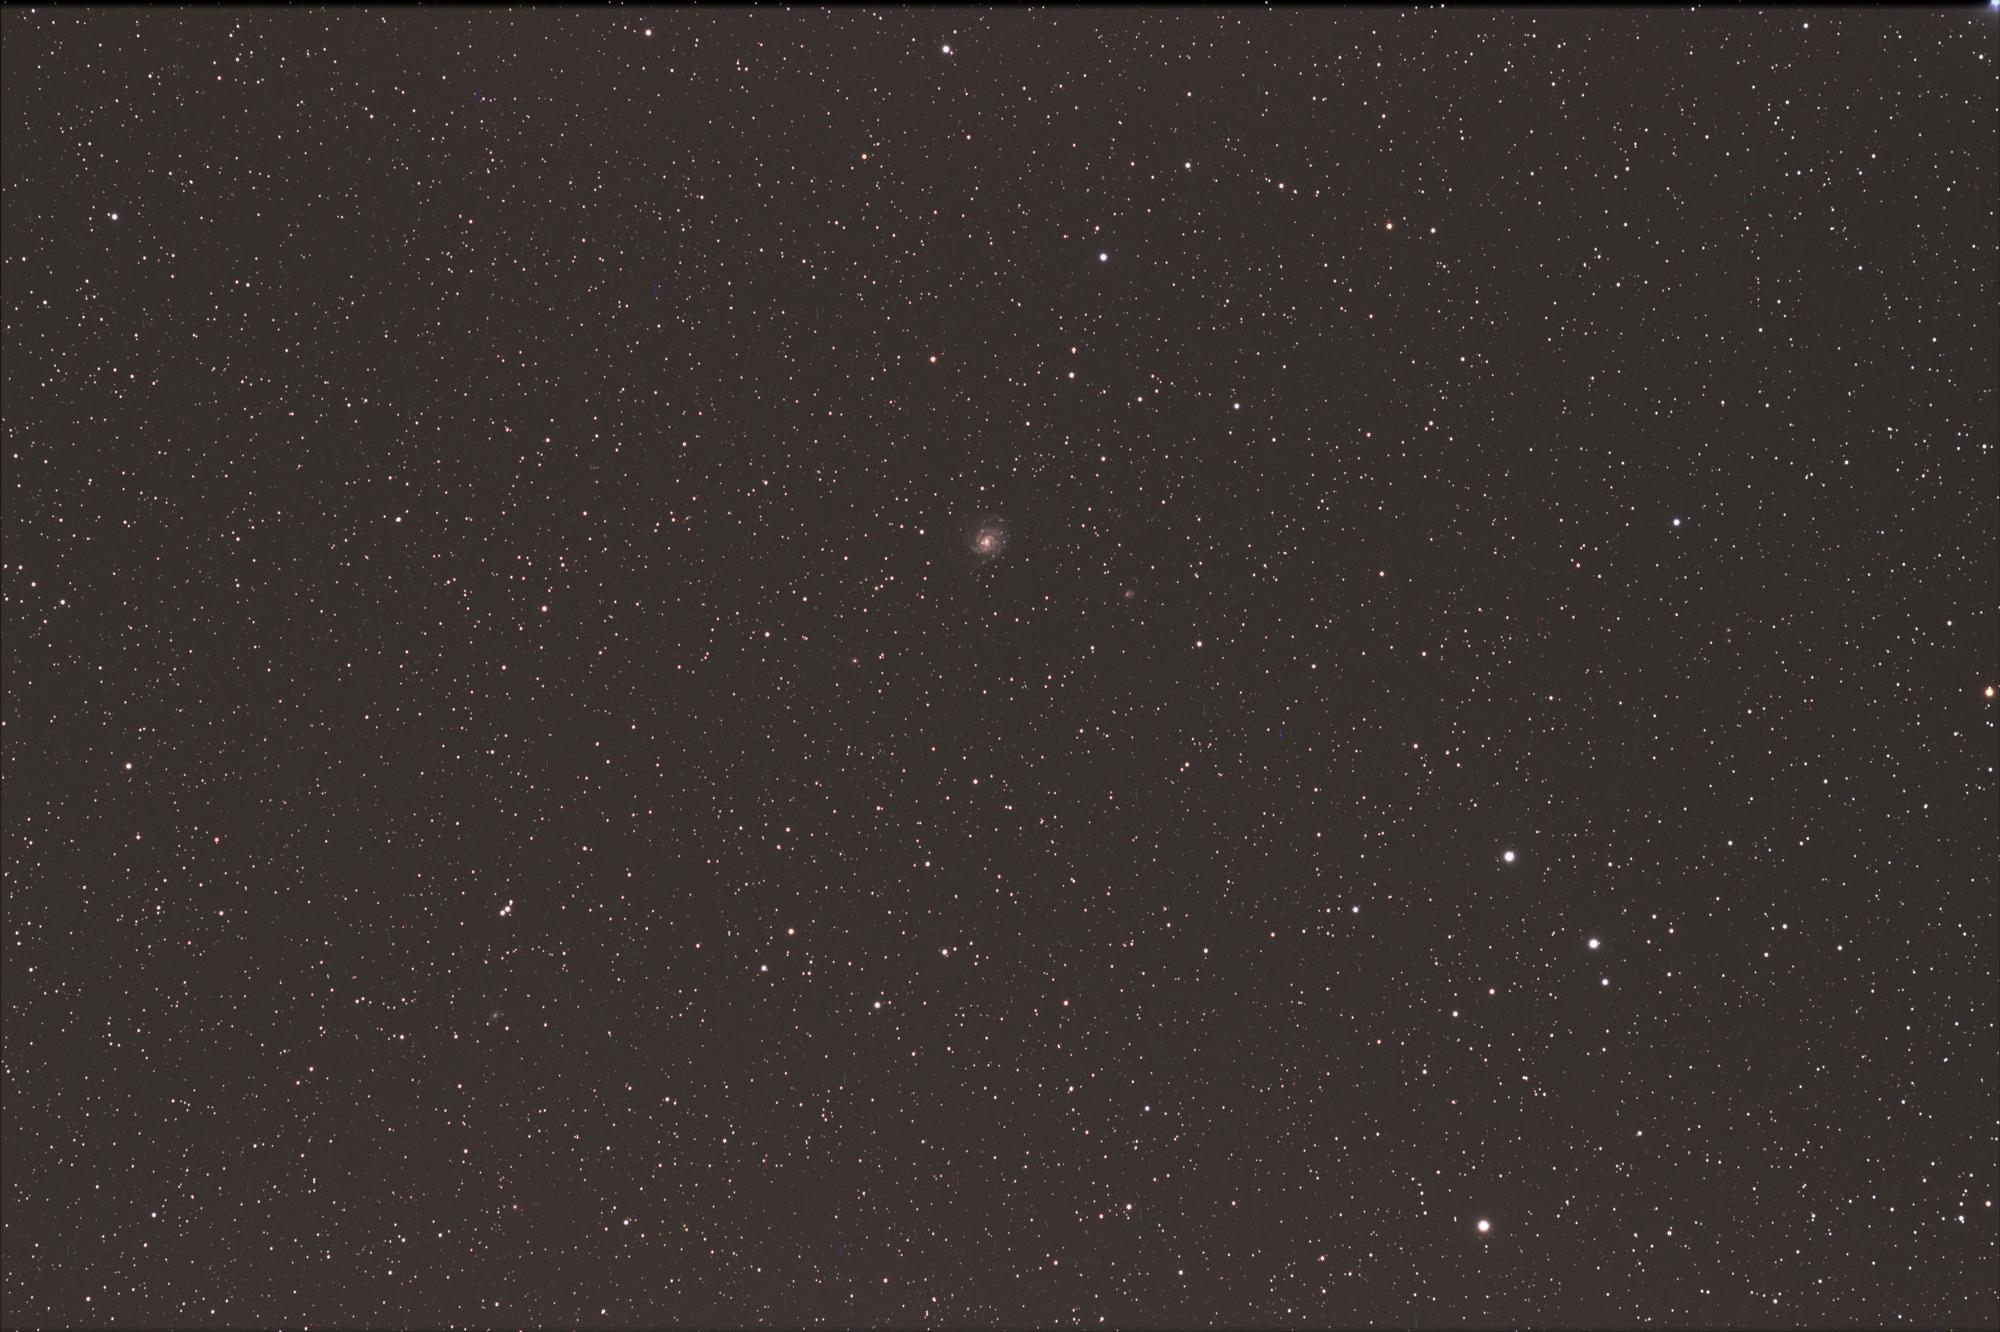 f:id:snct-astro:20180323165950j:plain